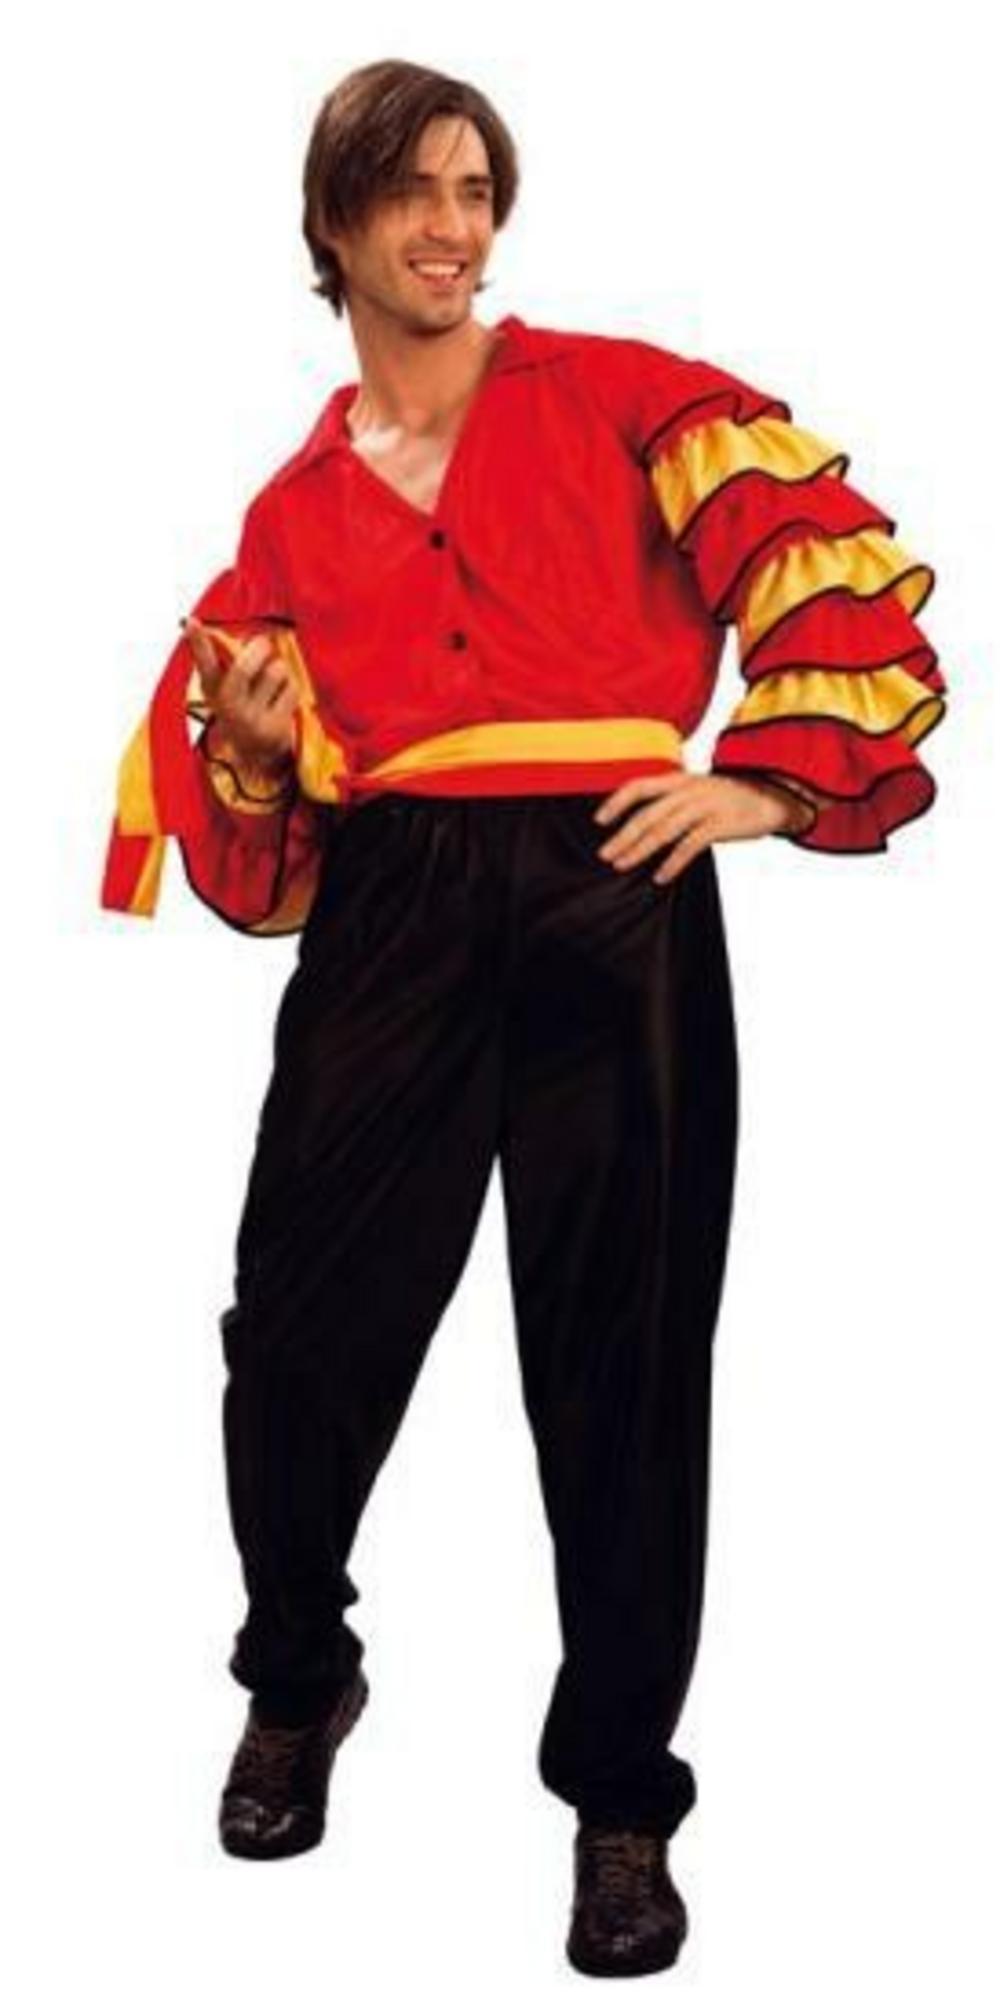 Spanish Rumba Man Flamenco Dancer Costume | Fun Fancy Dress | Mega Fancy Dress